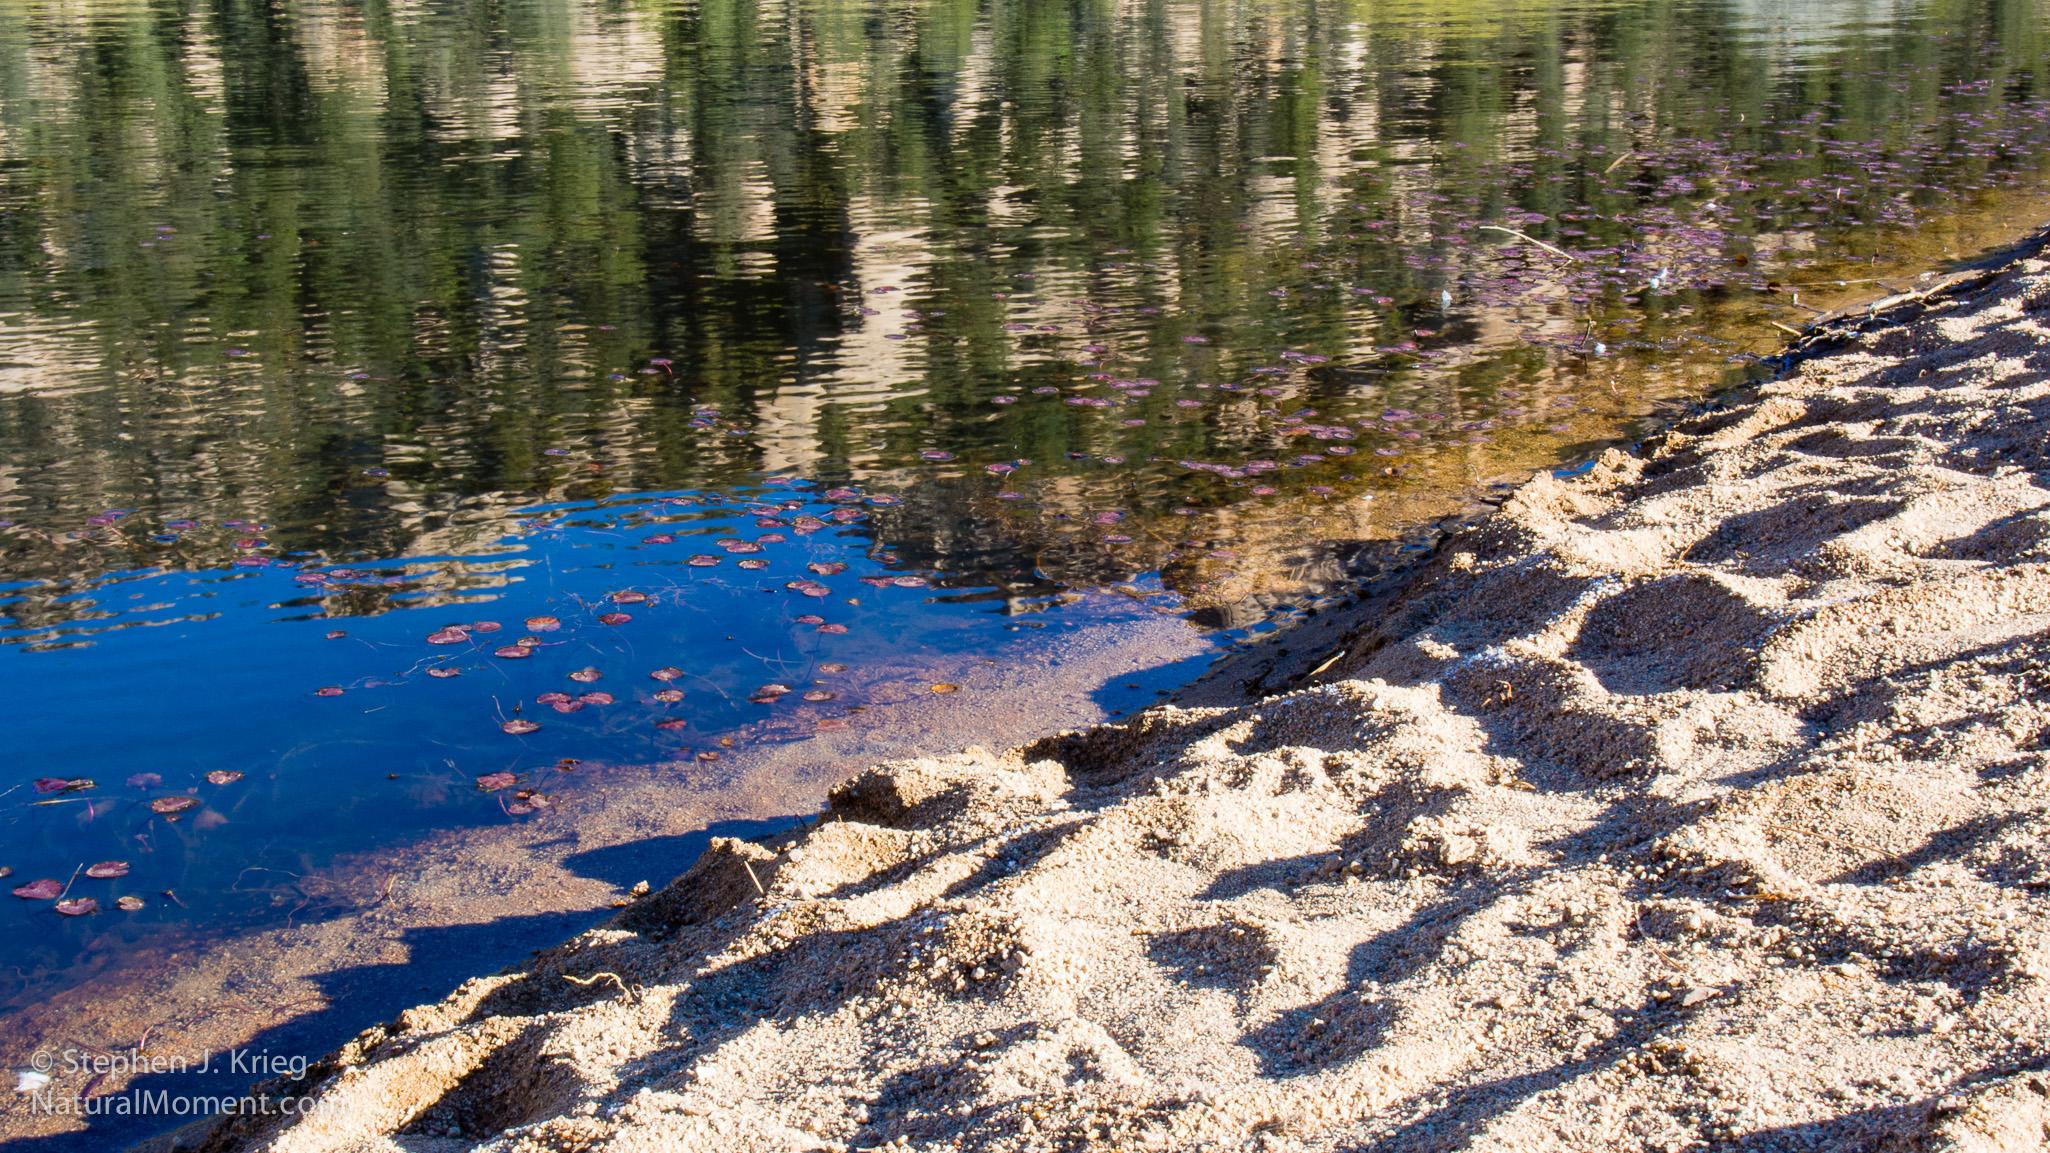 Stephen Krieg April Morning Granite Lake